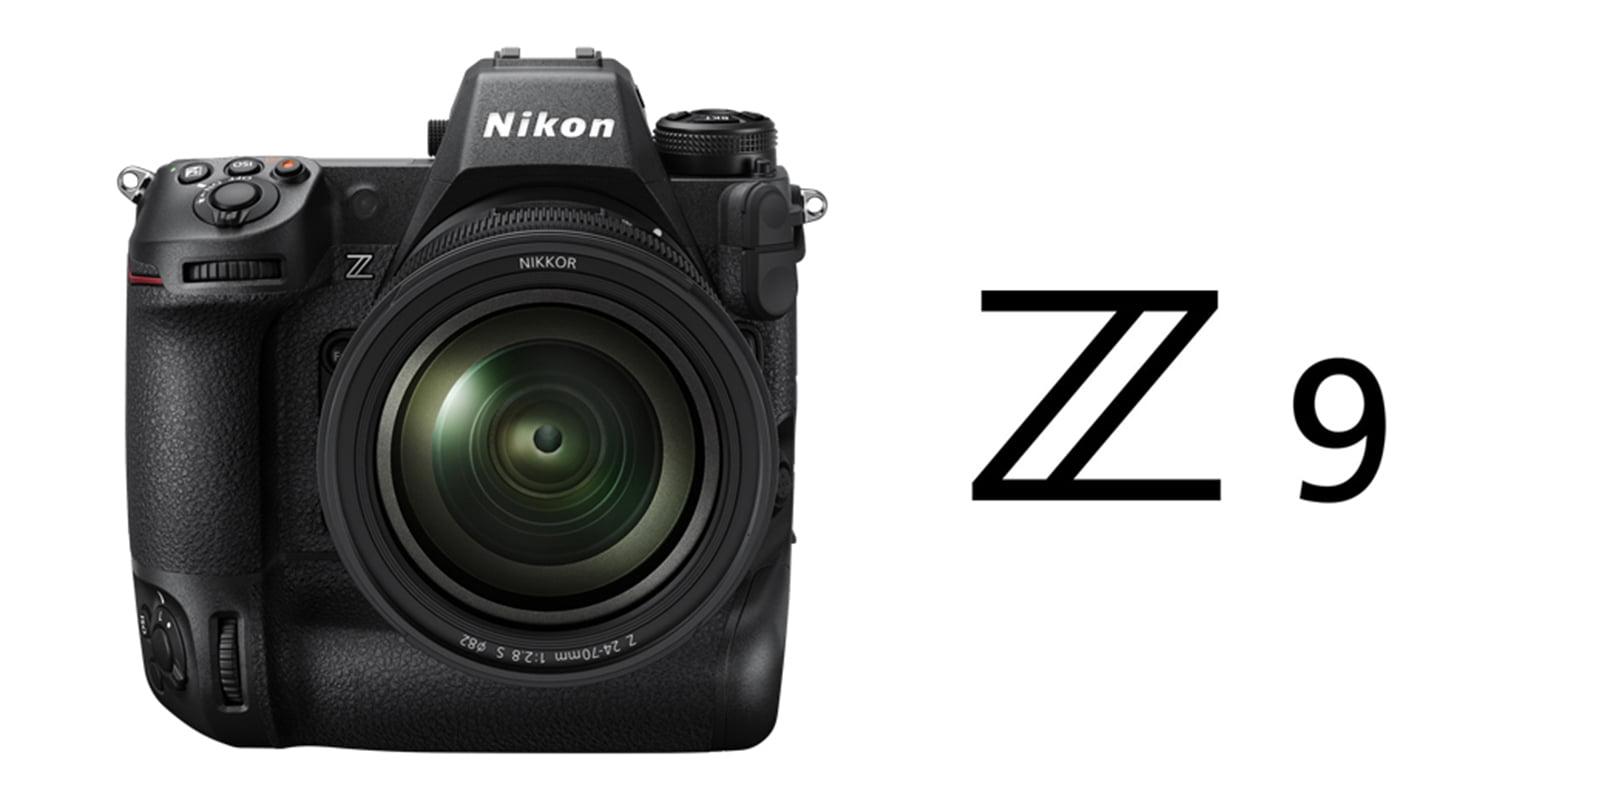 Nikon unveils flagship Z9 mirrorless camera